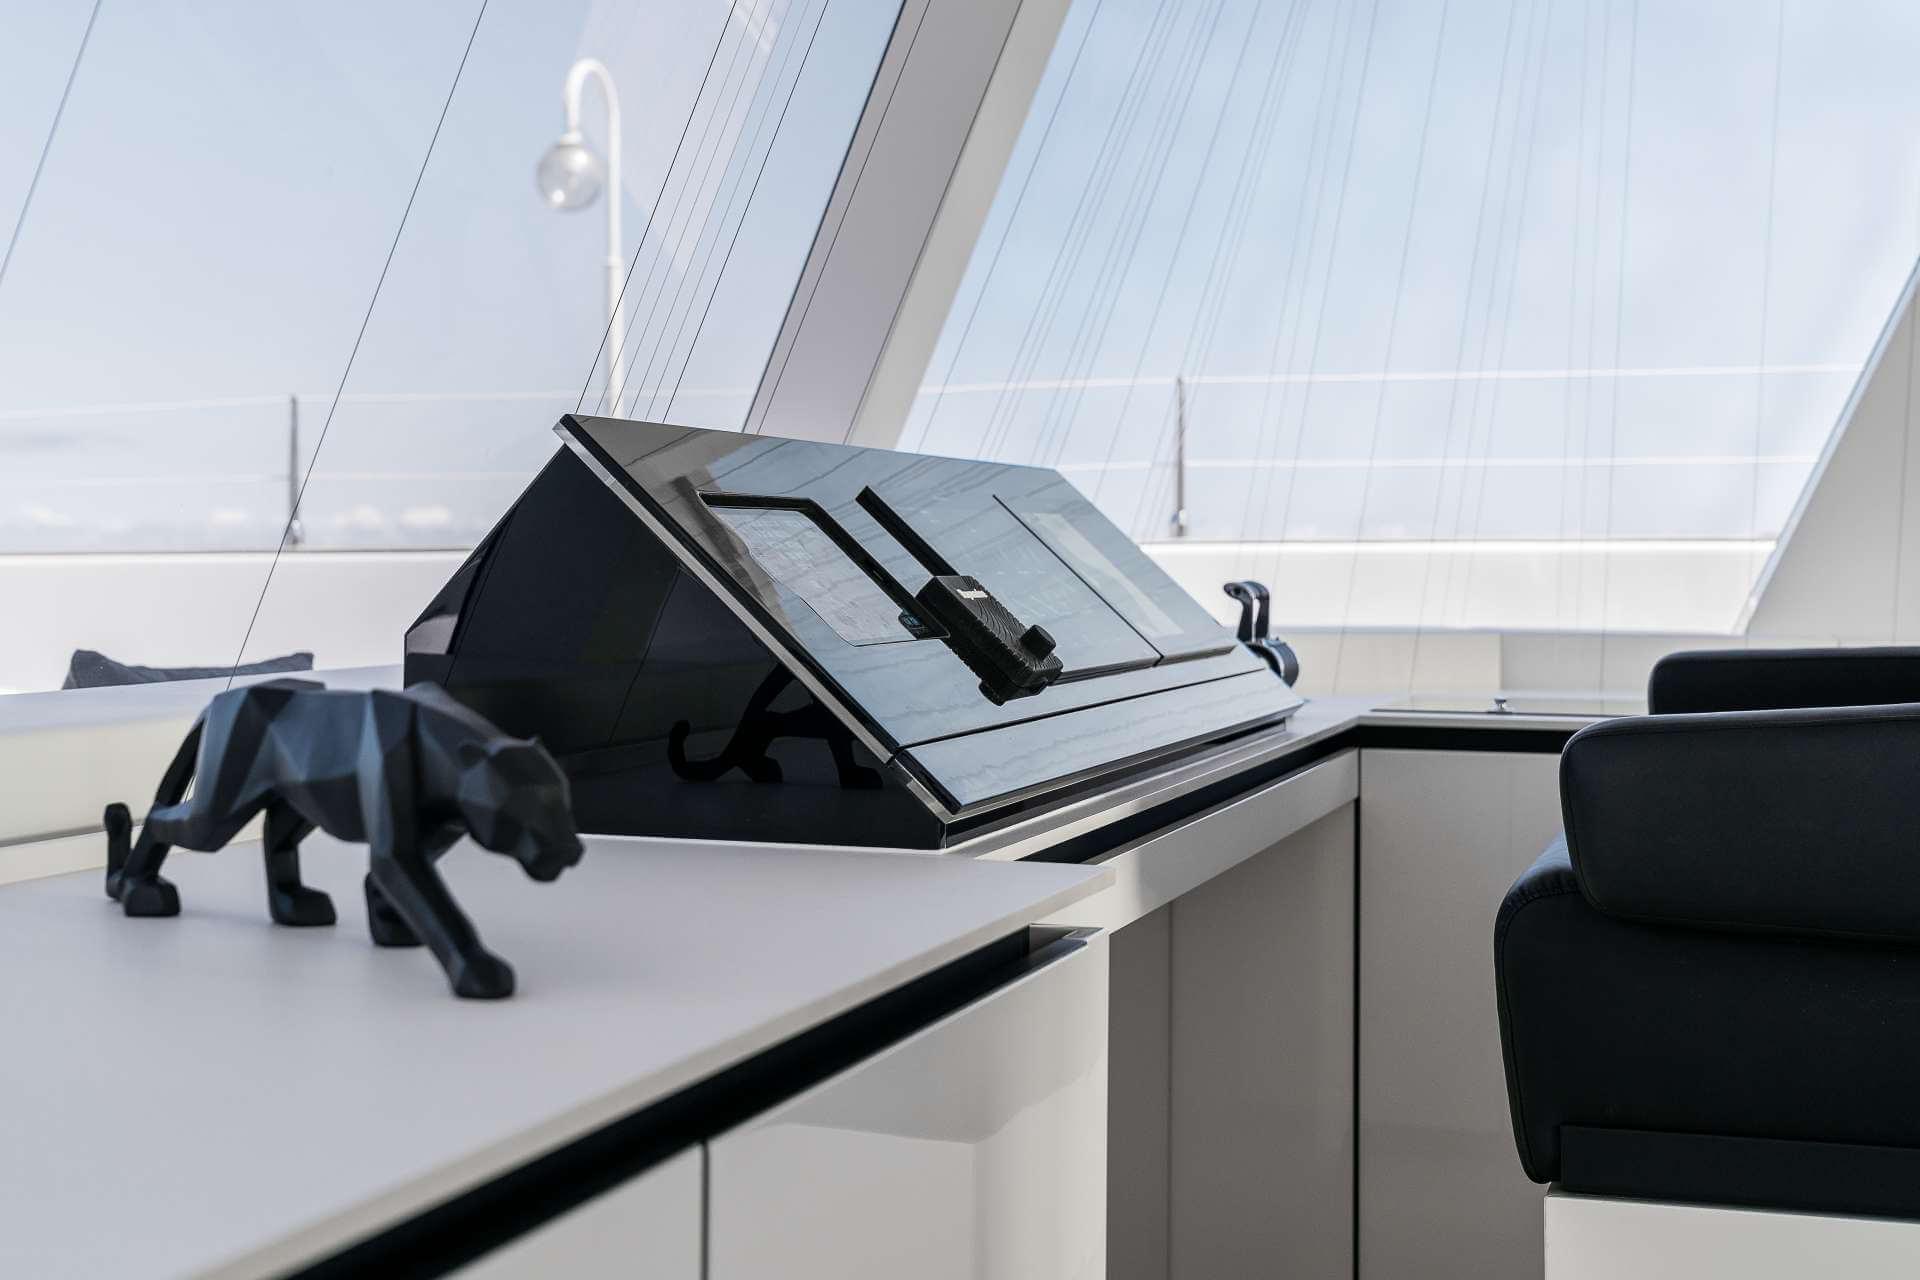 ABOVE Sunreef Catamaran 12